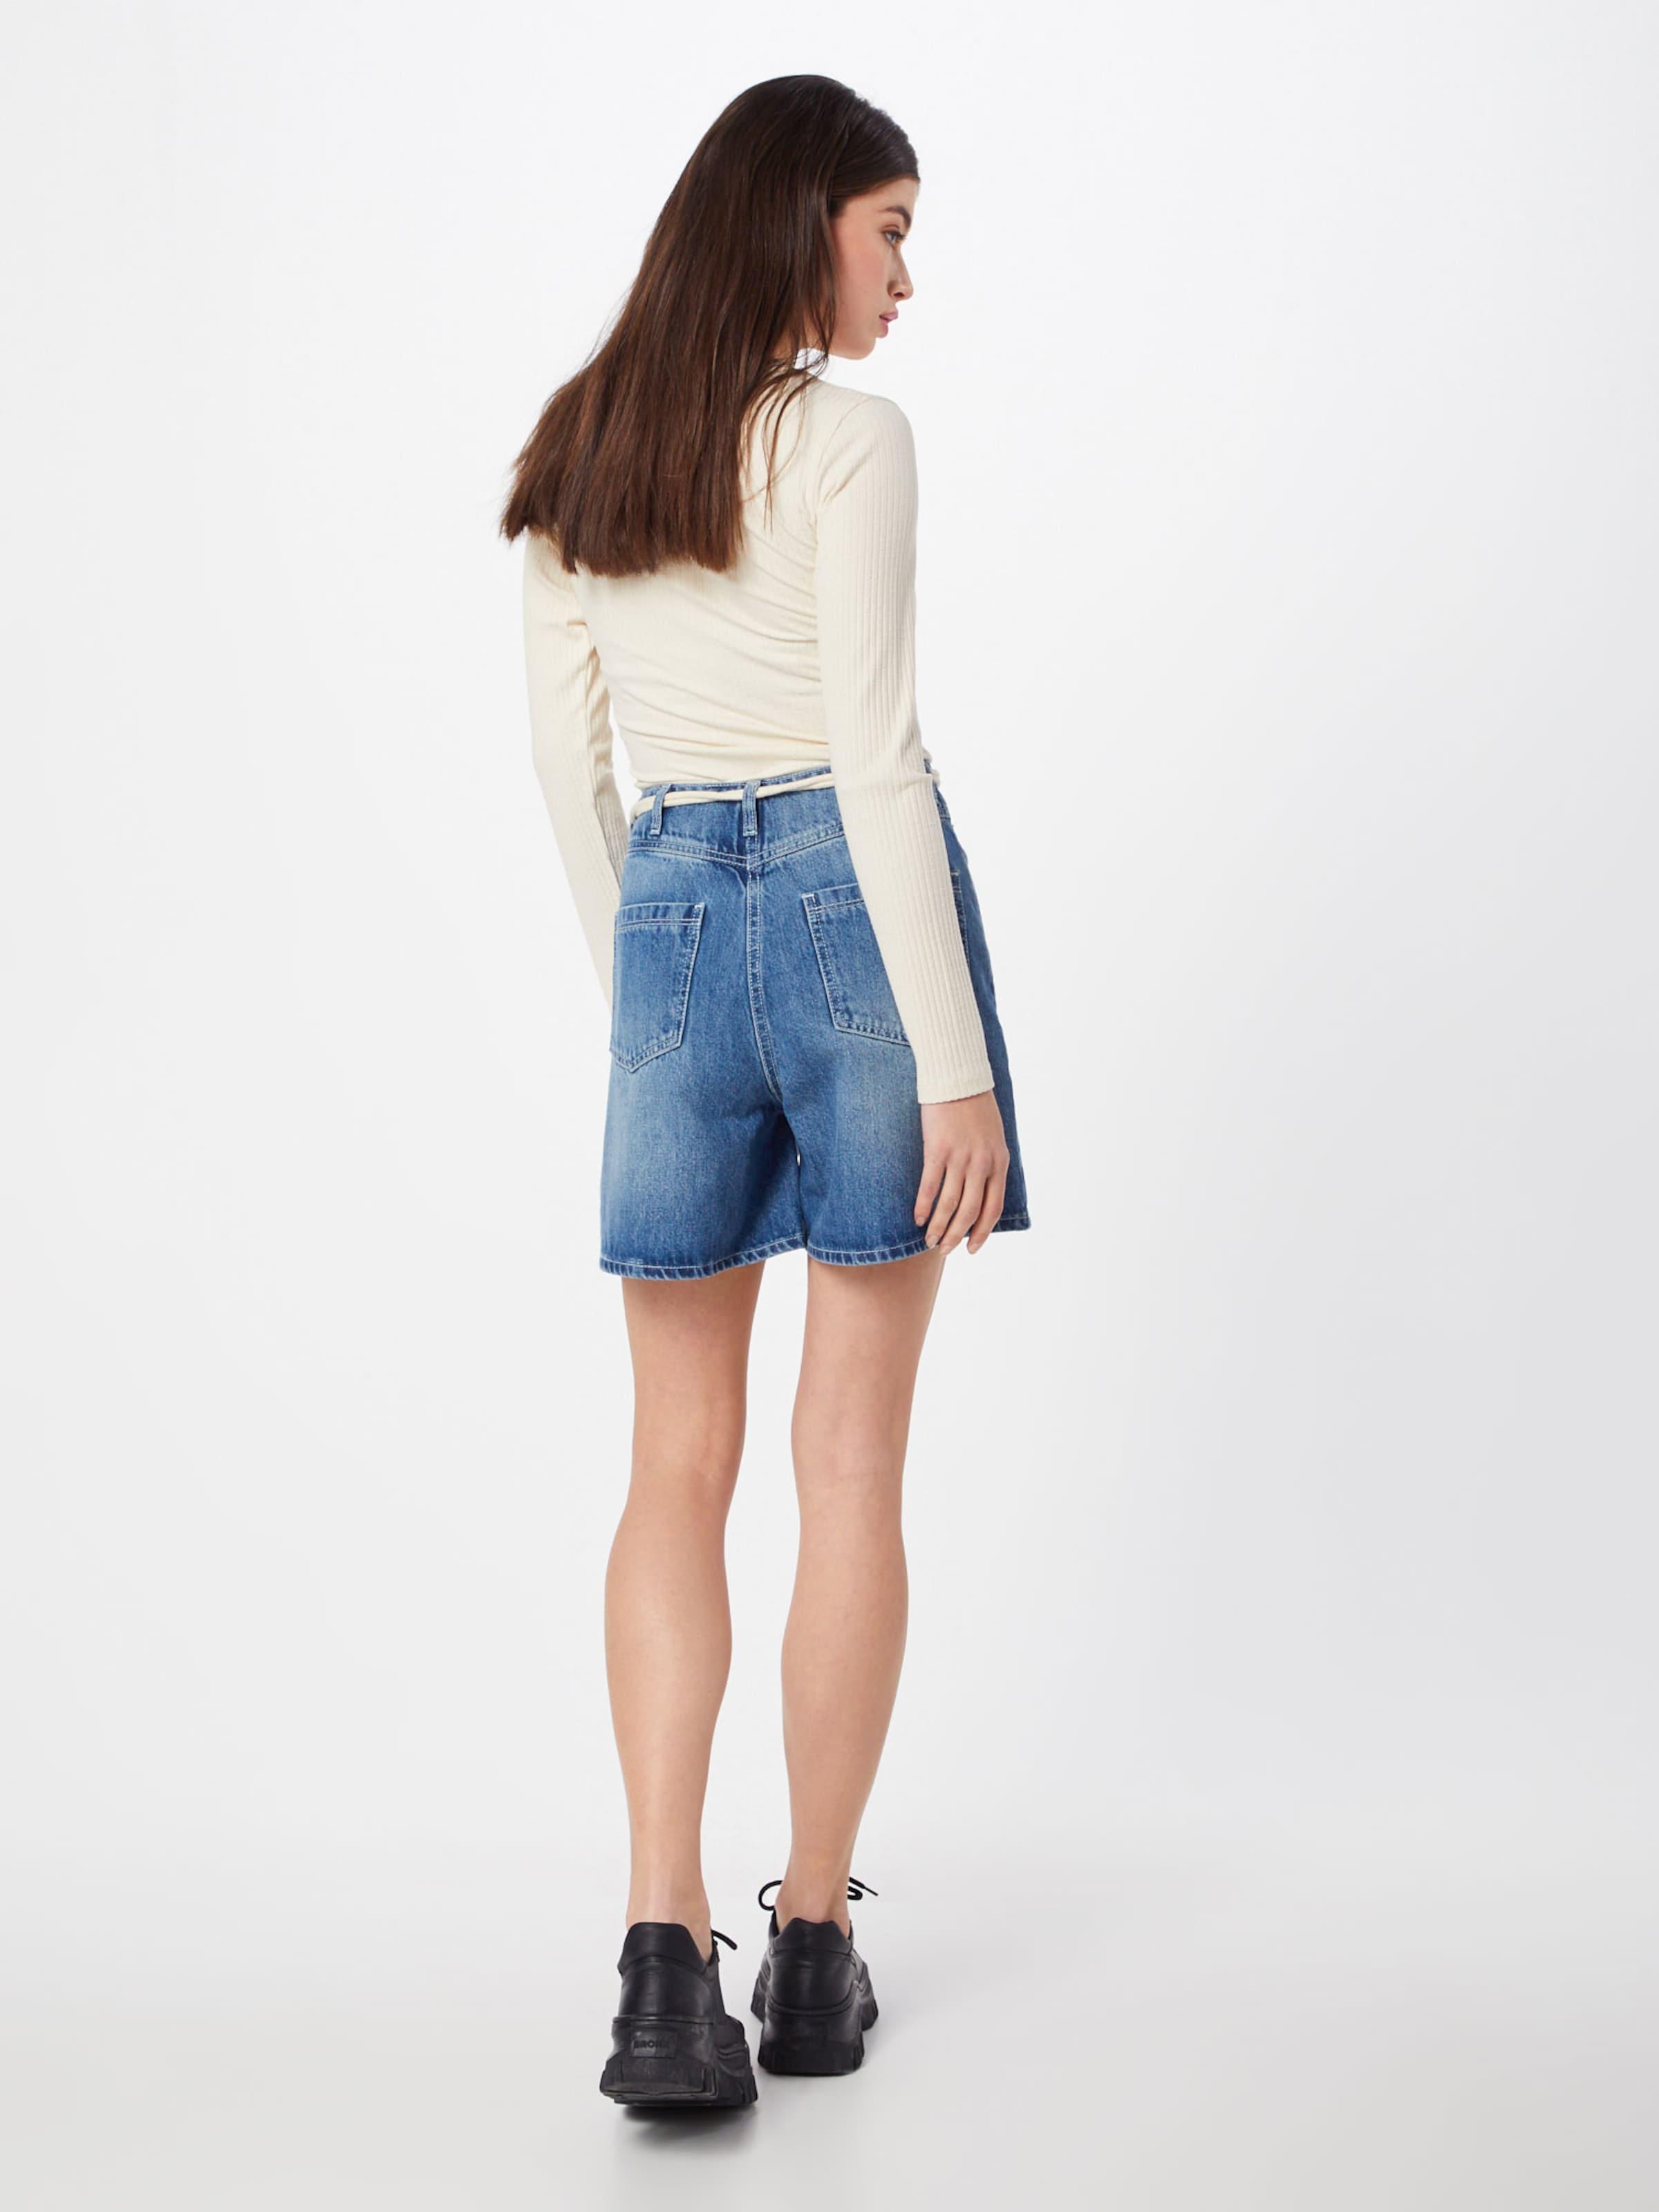 Denim Review on Bleu En Cut Shorts' 'hw Jean lTc3JFKu1